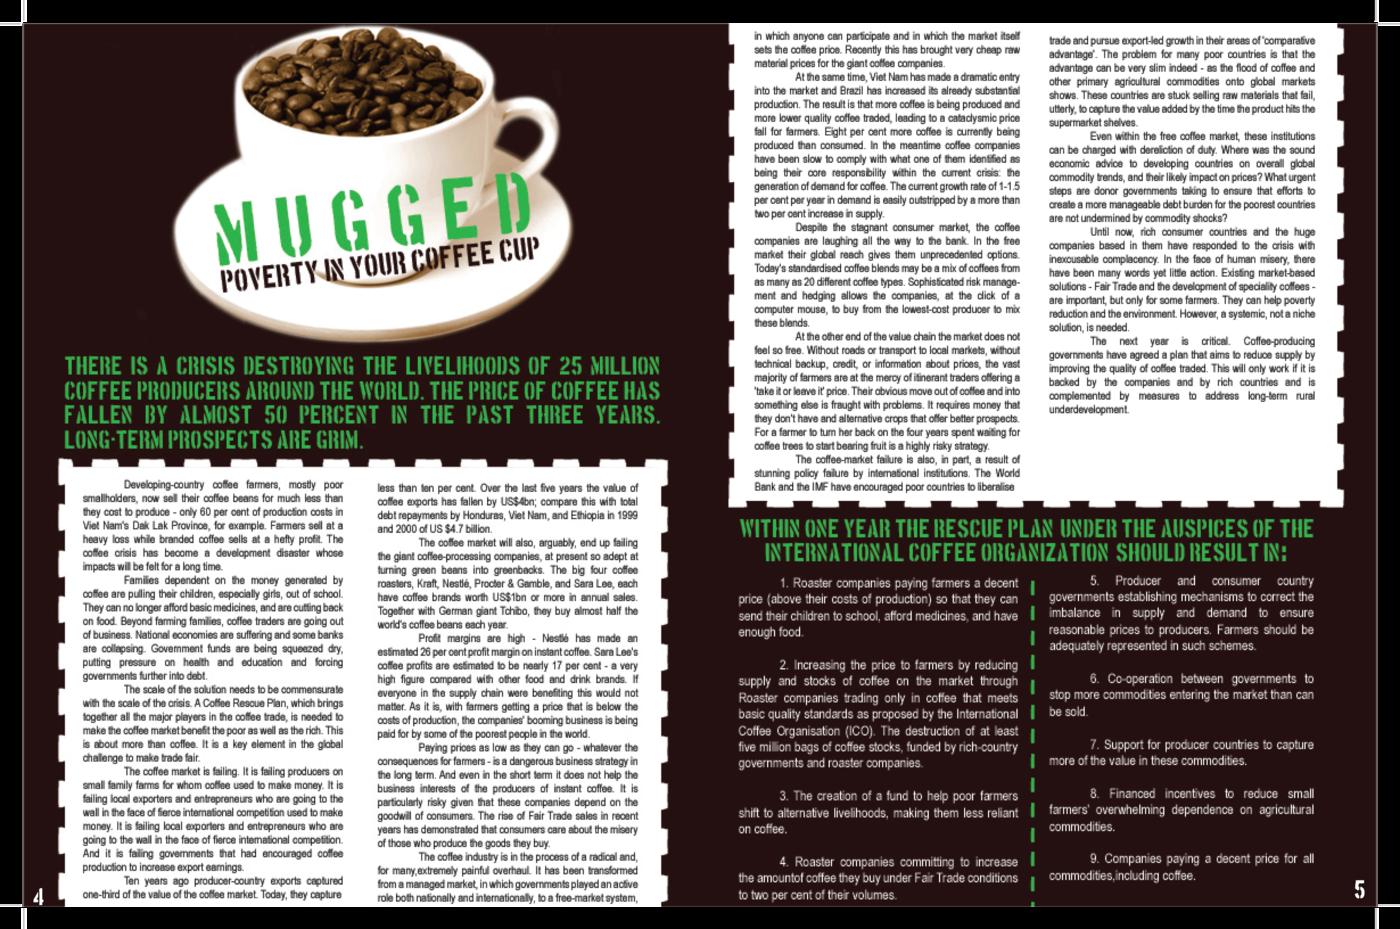 Make Trade Fair Magazine by Meredith Barber at Coroflot com